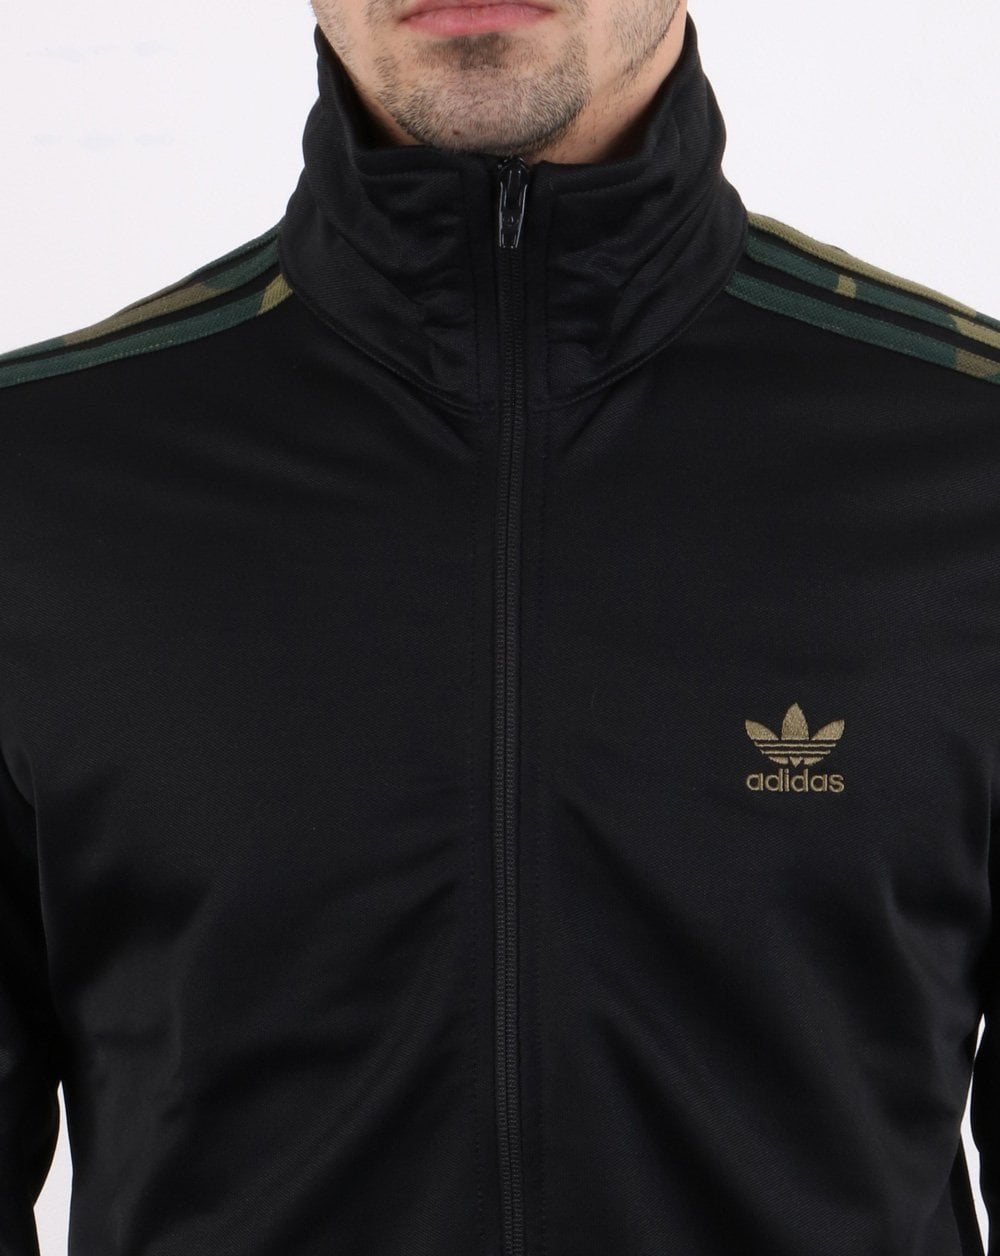 Adidas Camo SST Track Jacket Mens, S 46: : Bekleidung